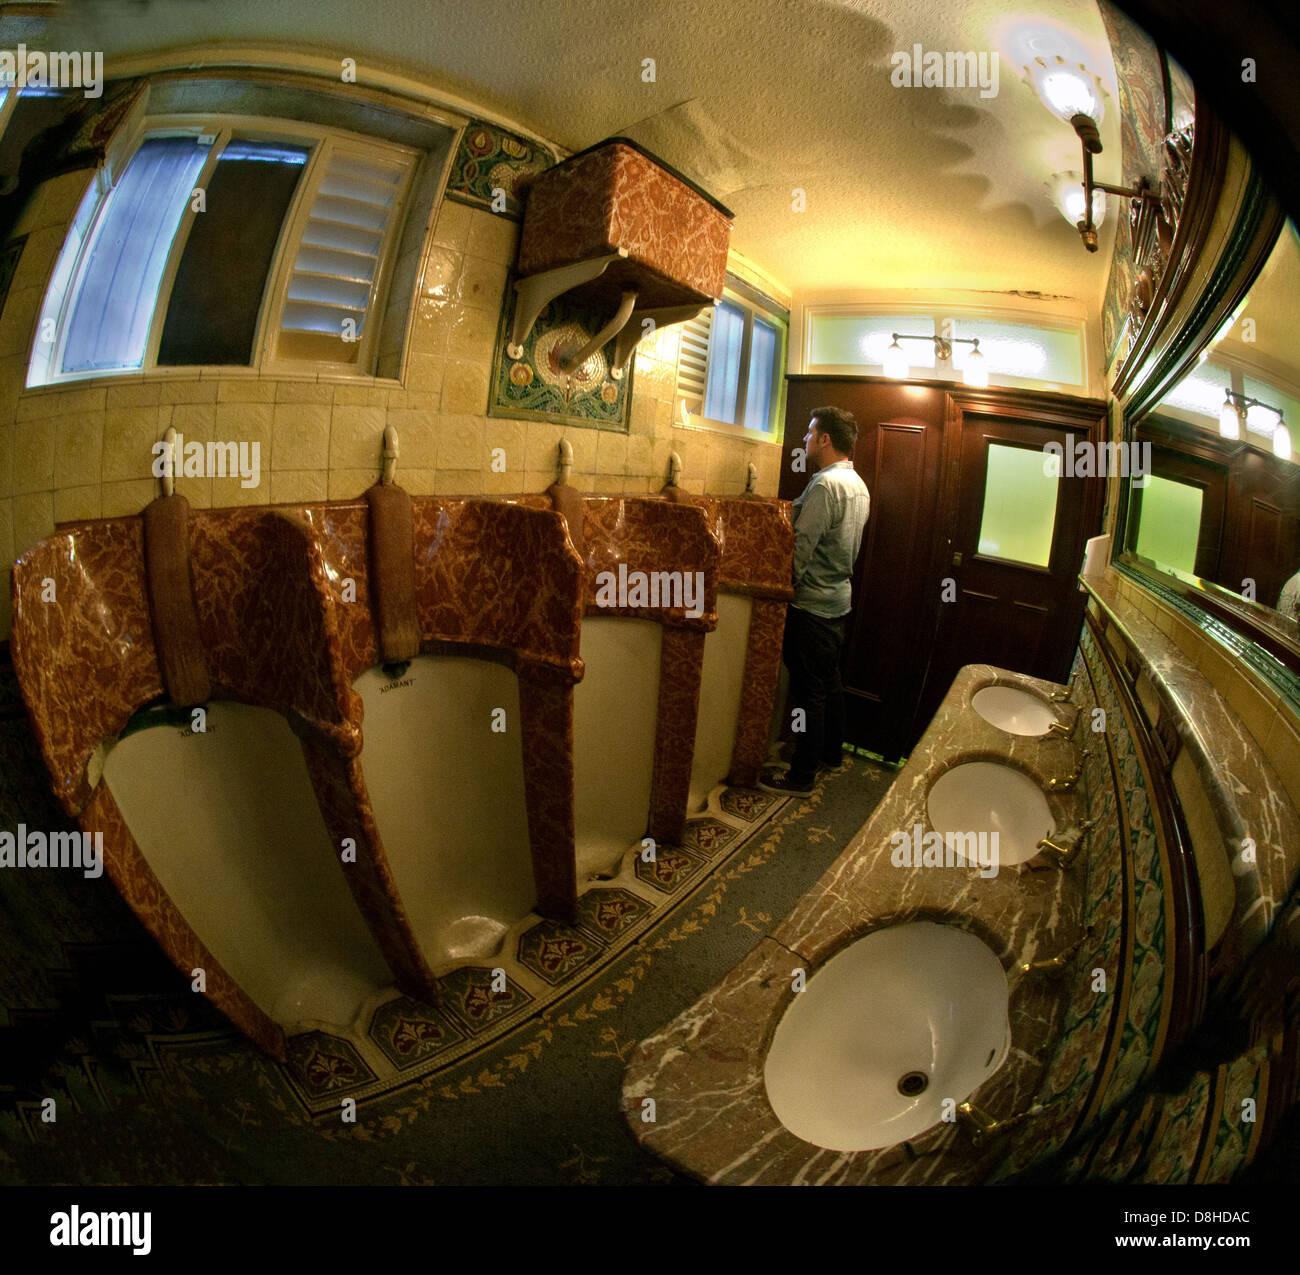 The famous Hope St Phillarmonic Pub Urinals, Liverpool England UK - Stock Image